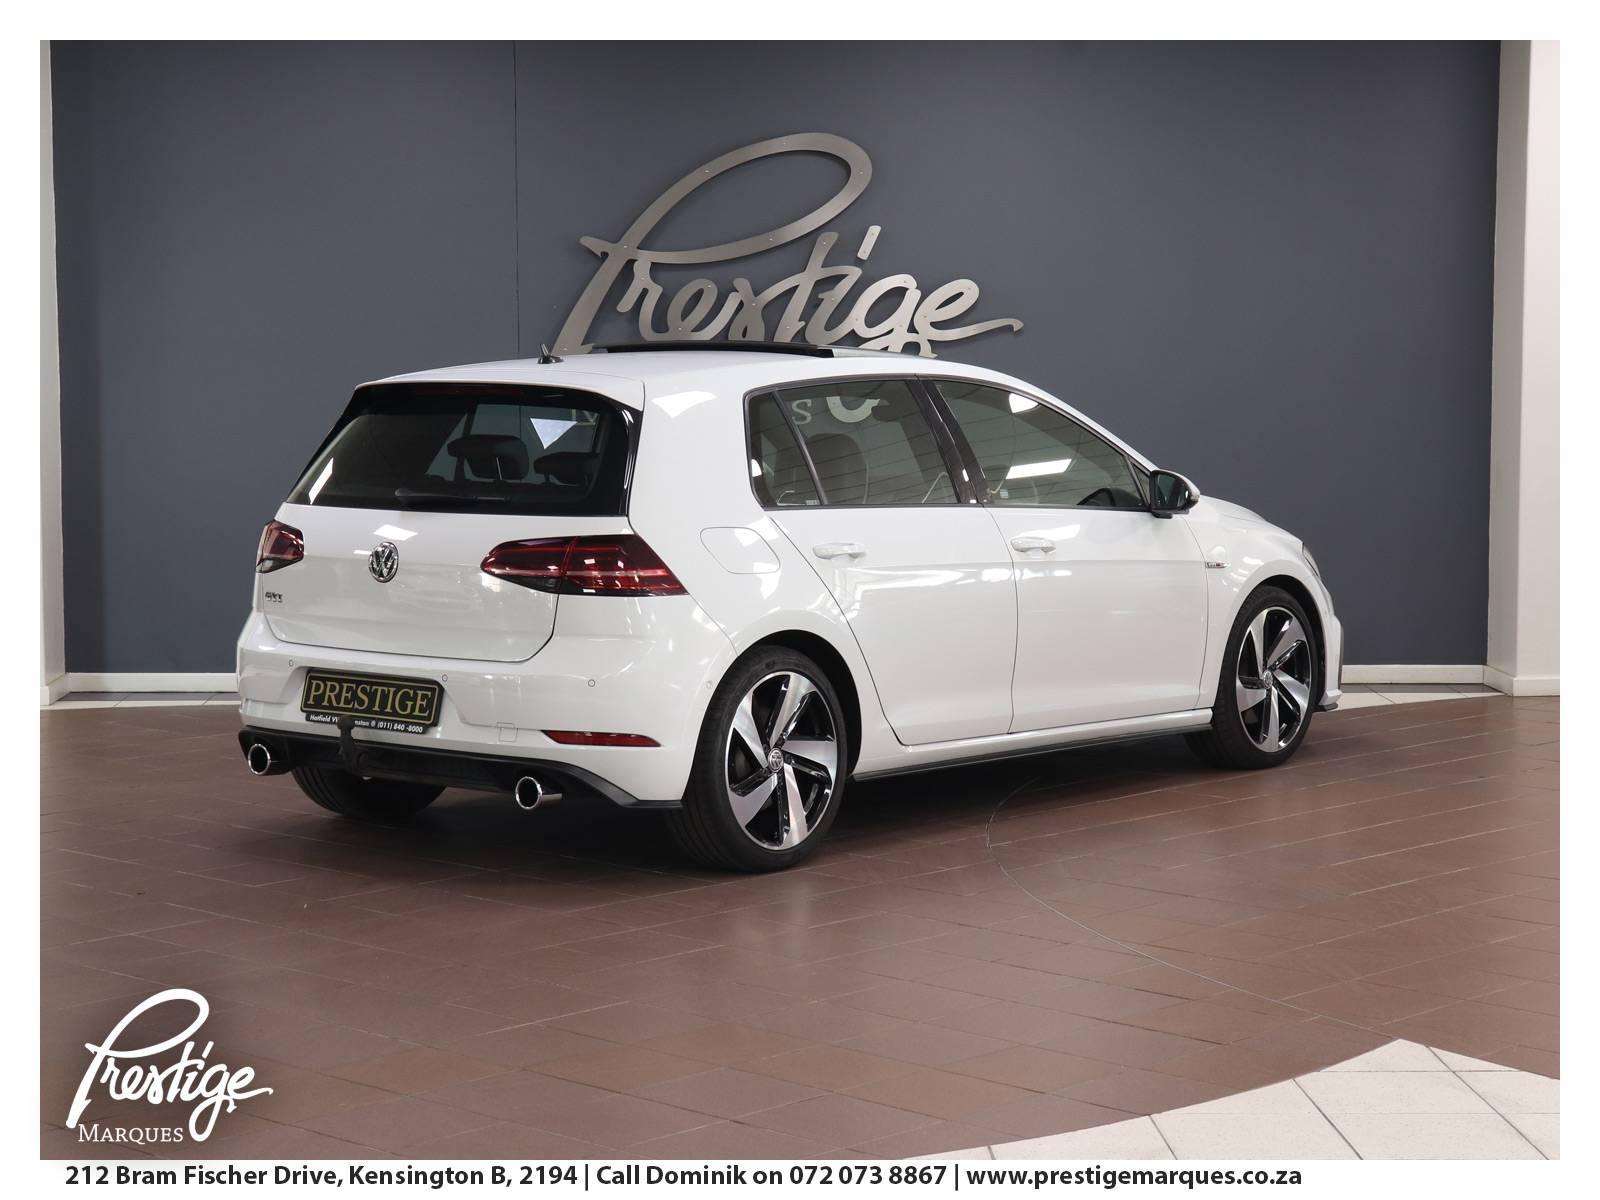 2017-Volkswagen-Golf-GTI-DSG-Facelift-Prestige-Marques-Randburg-Sandton-3